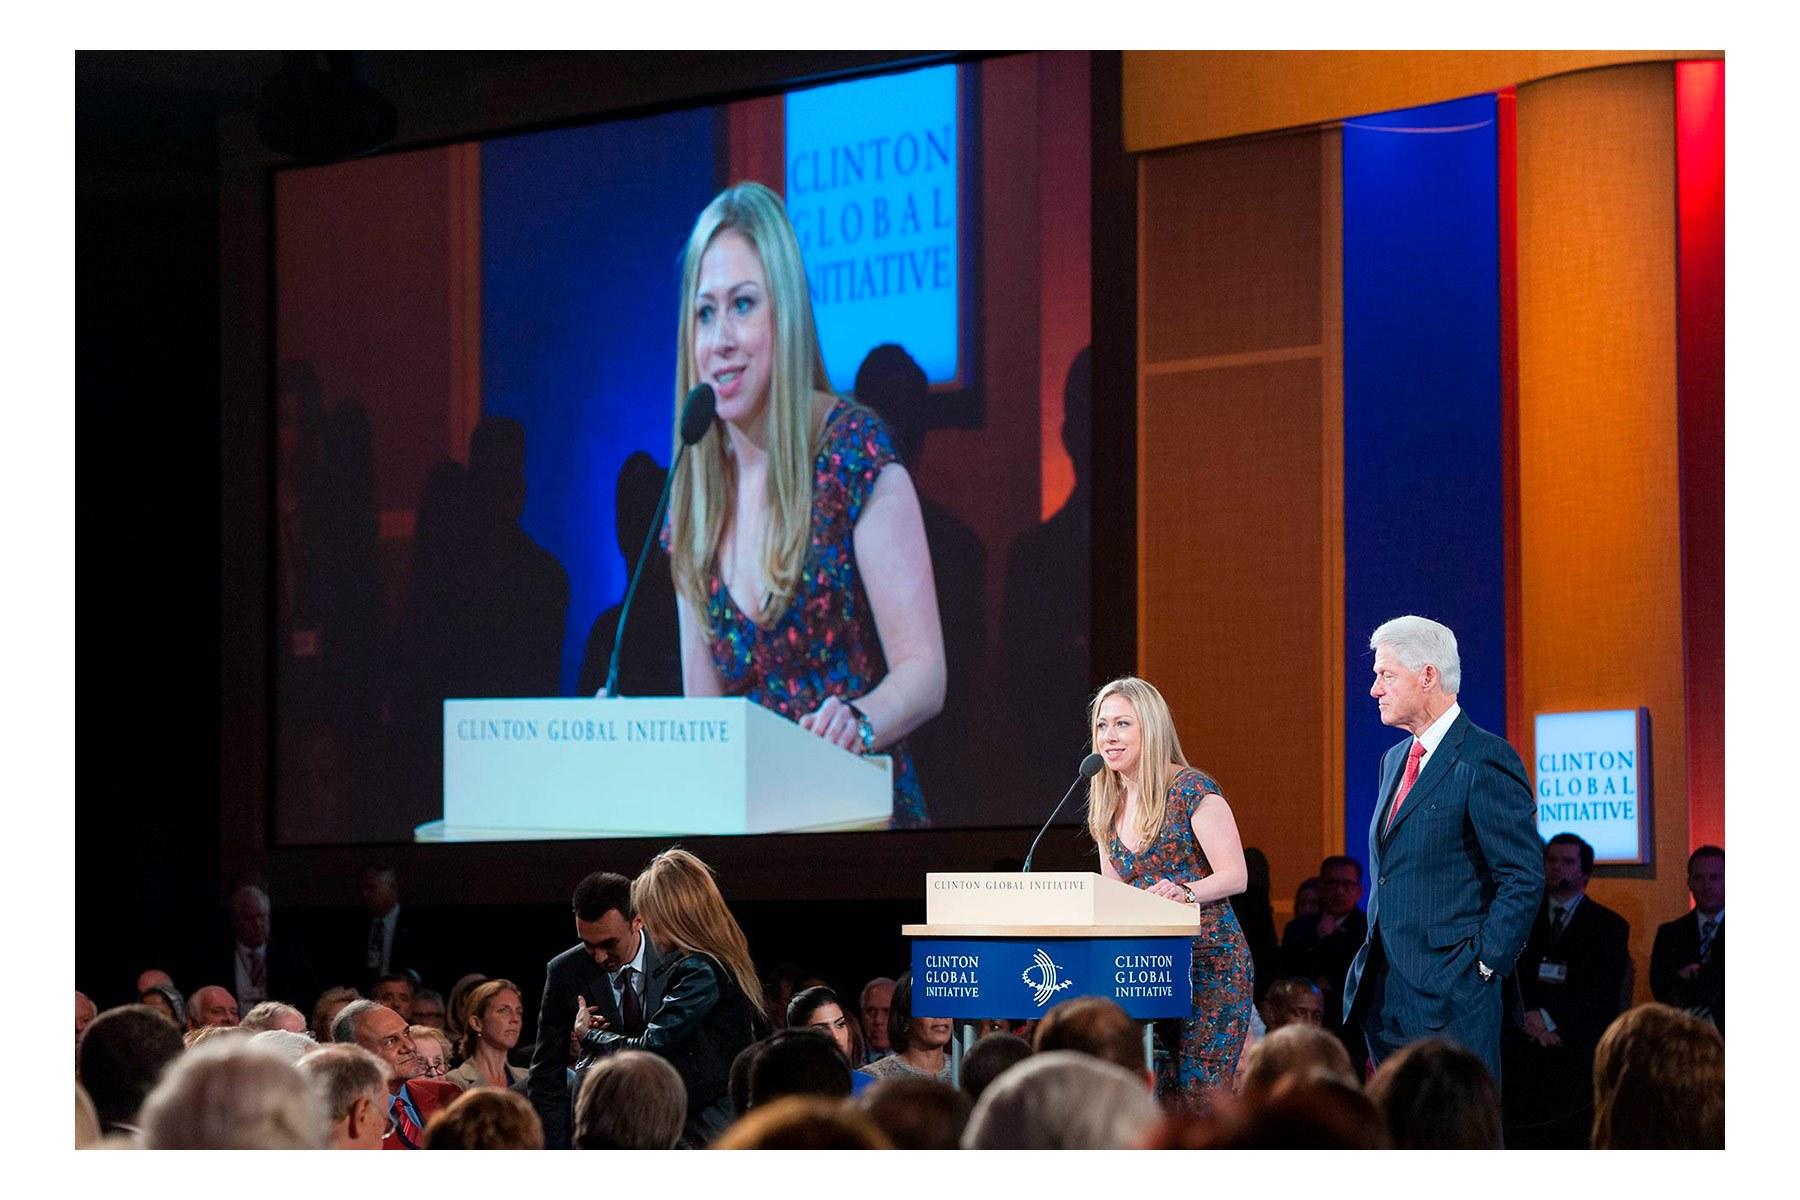 Chelsea Clinton, Closing Plenary, Clinton Global Initiative, CGI 2012 meetings, Designing for Impact, New York, September 2012